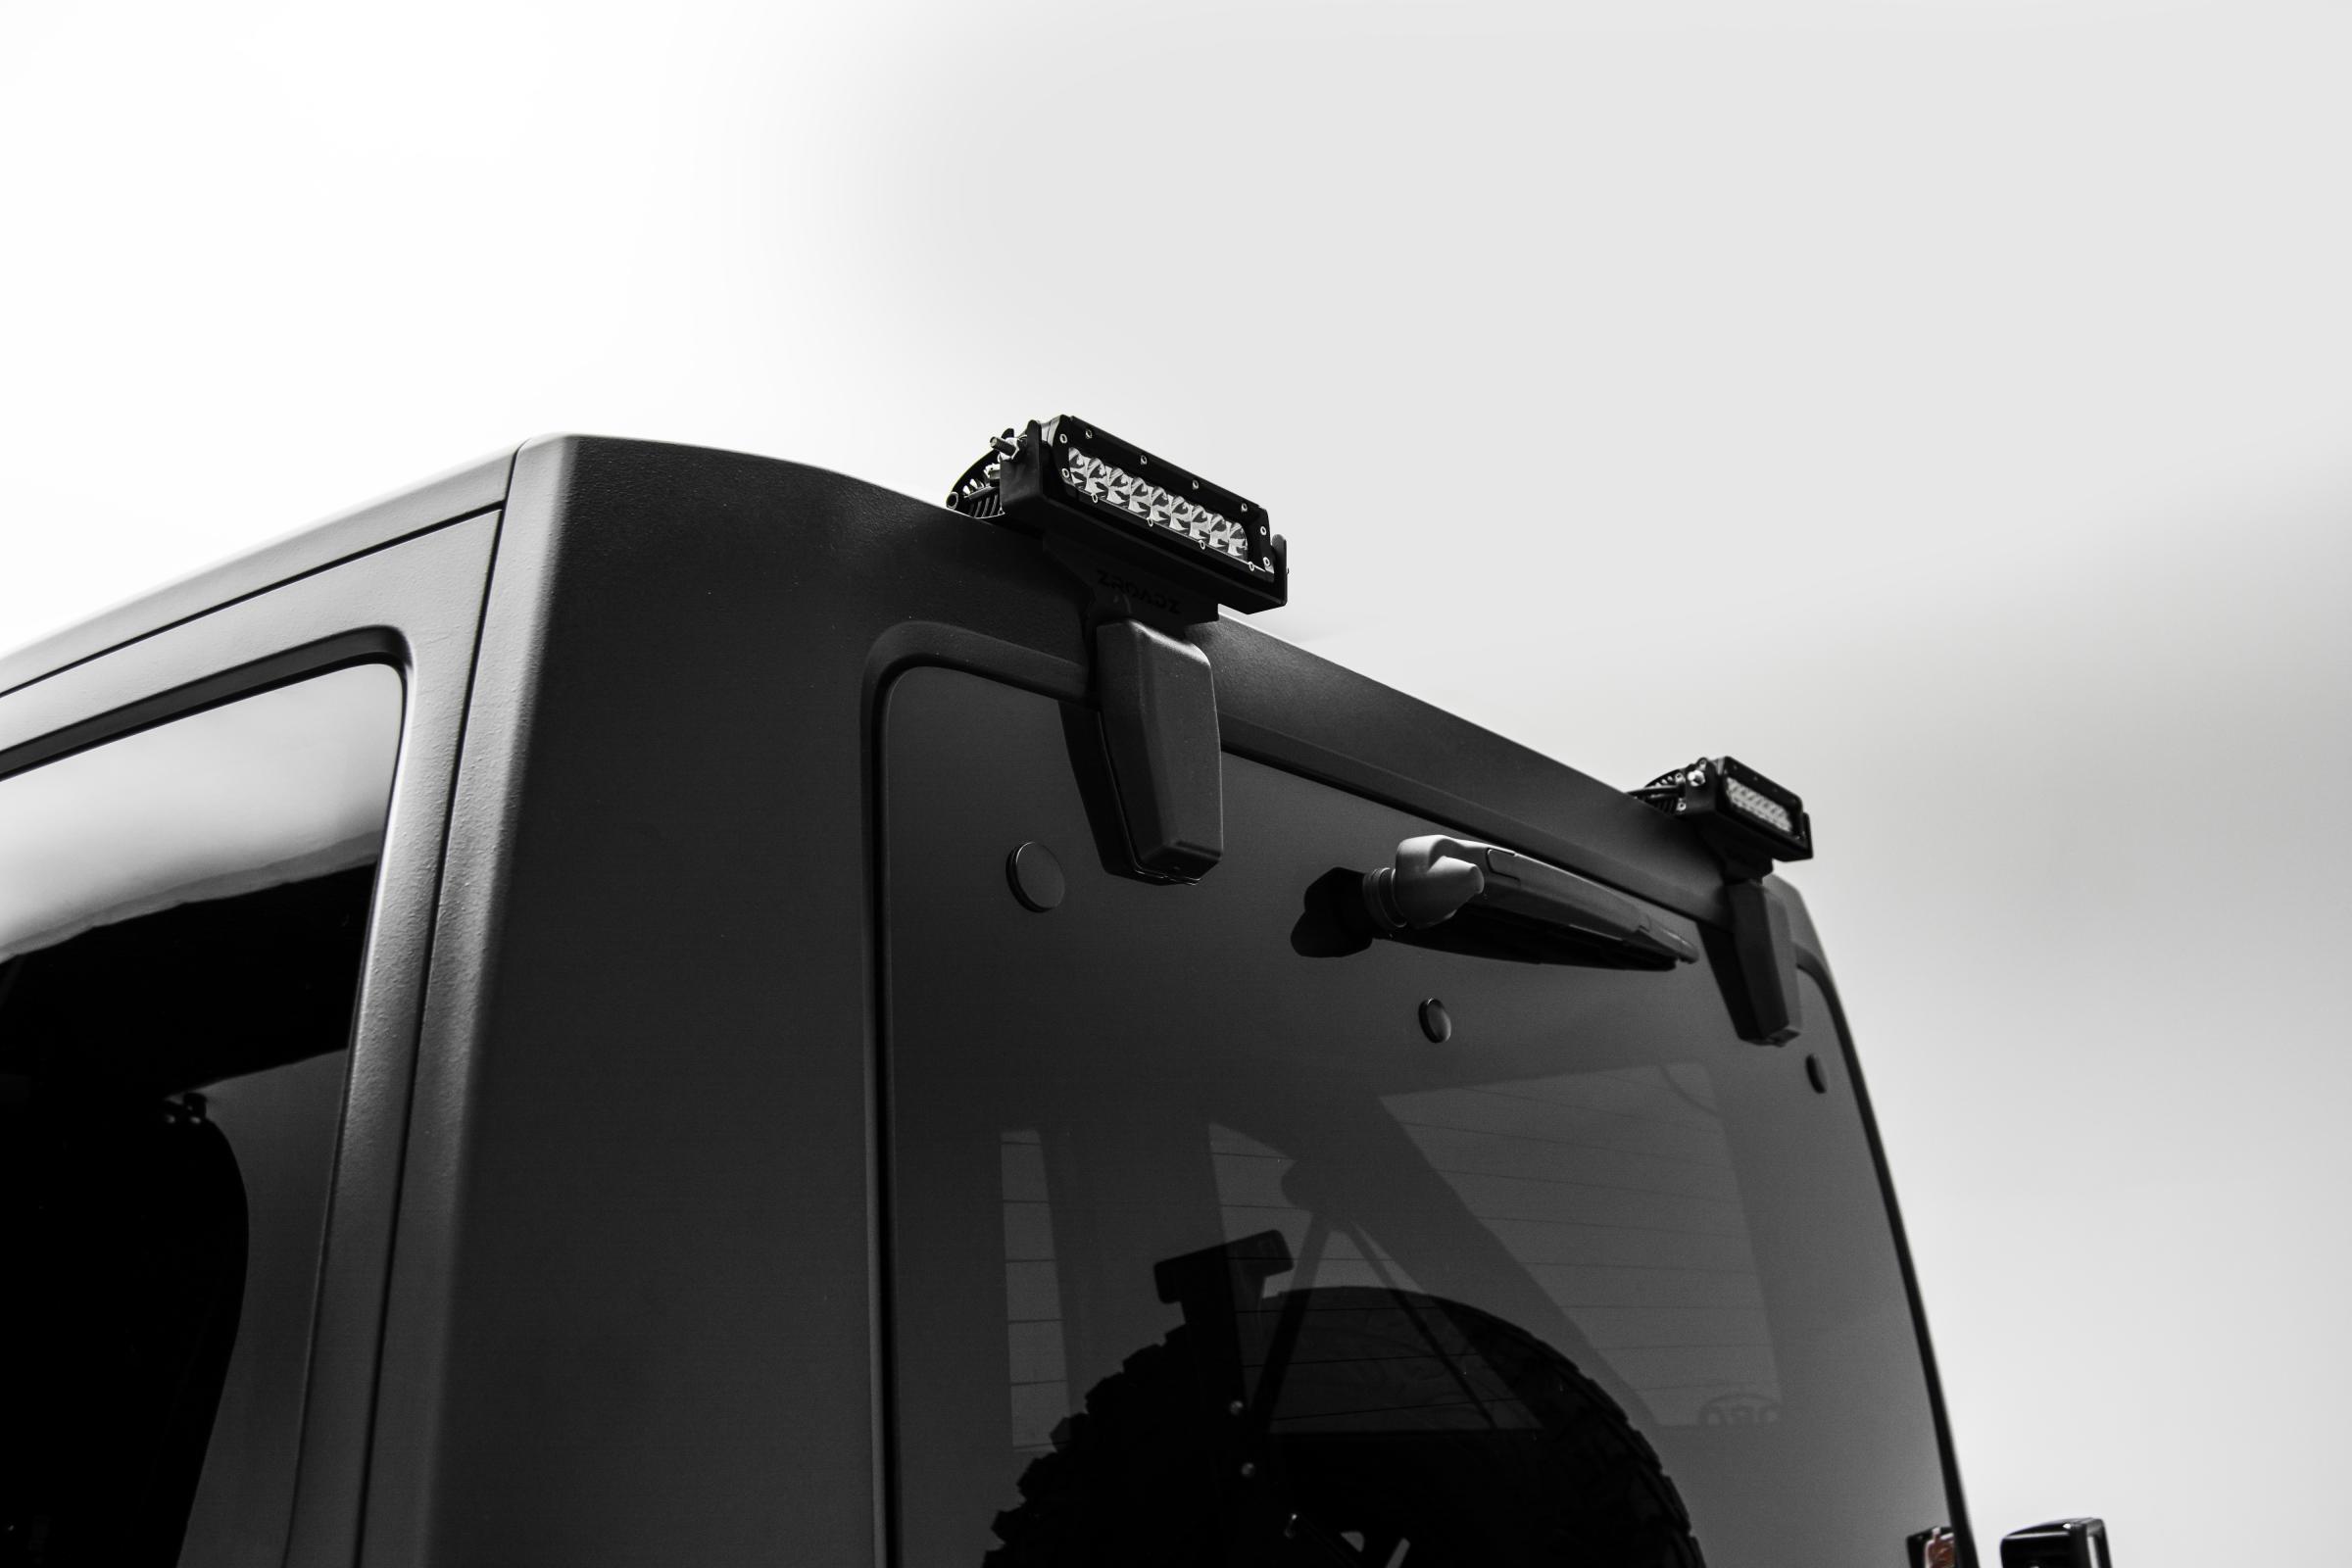 Universal Wiring Harness For Single Led Light Bars 200 Watt Zroadz Jeep Hardtop 6 Inch Row Slim Line Mount Kit Rear Window Hinges 2007 2017 Wrangler